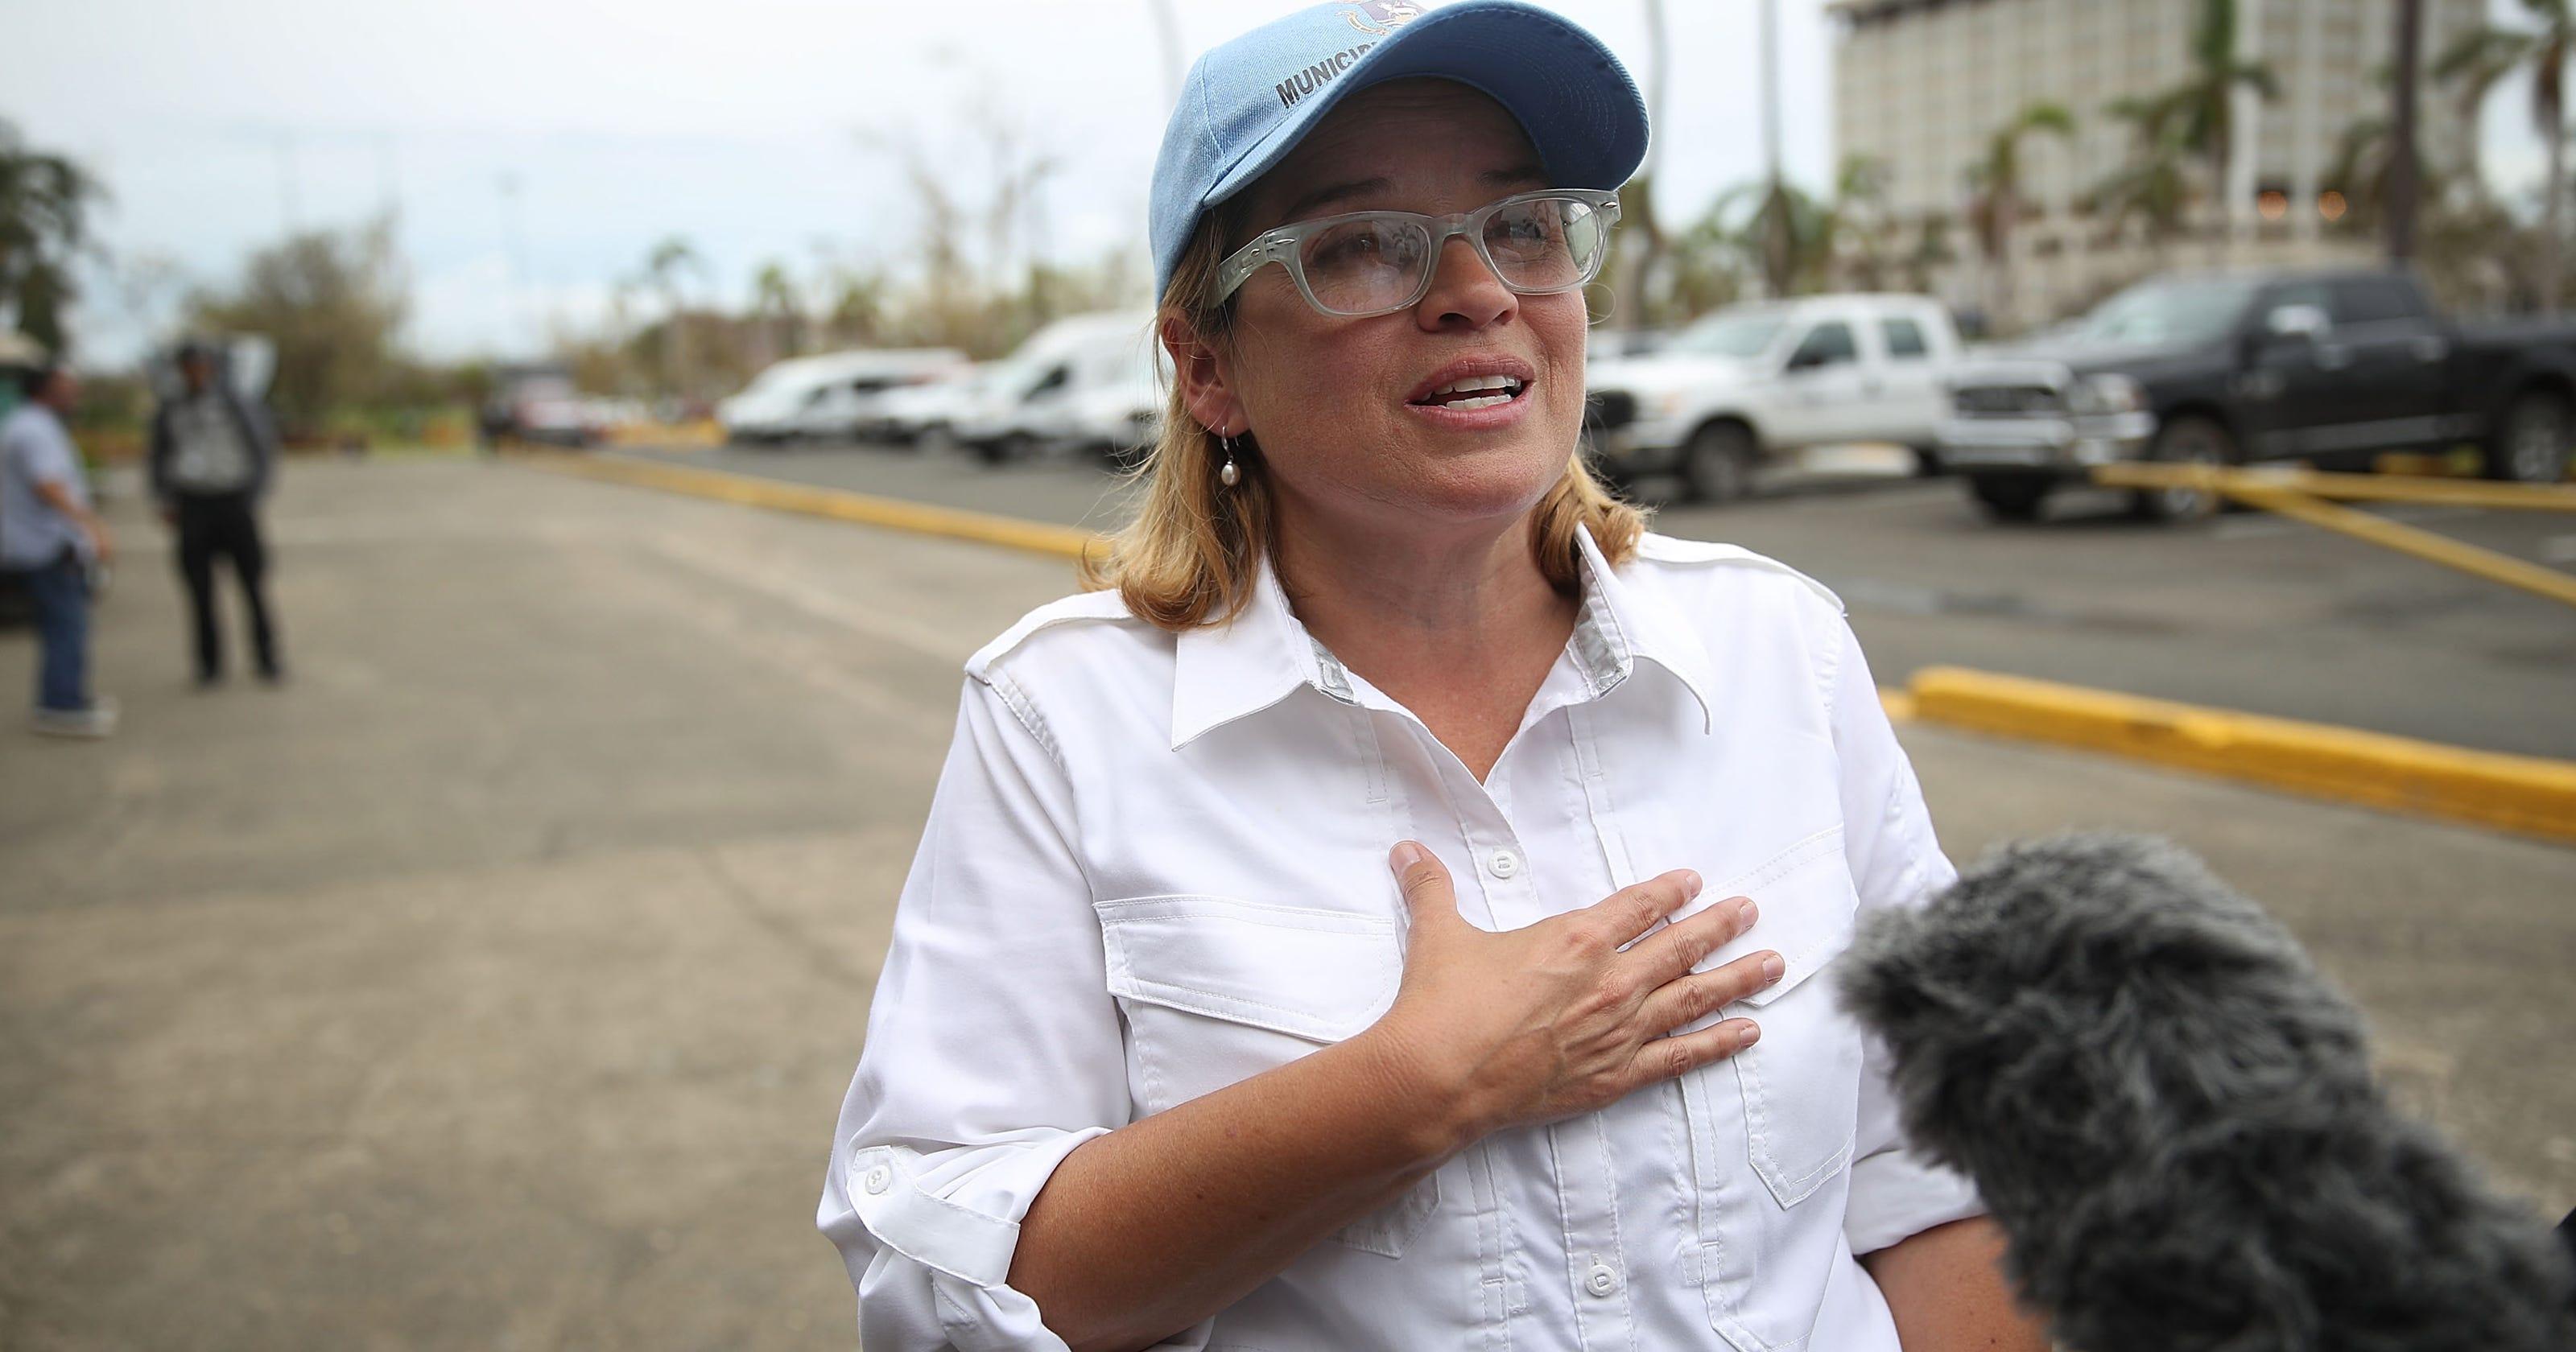 San Juan Mayor Carmen Yulin Cruz on Trump exchange: 'I don't give a  (expletive)'